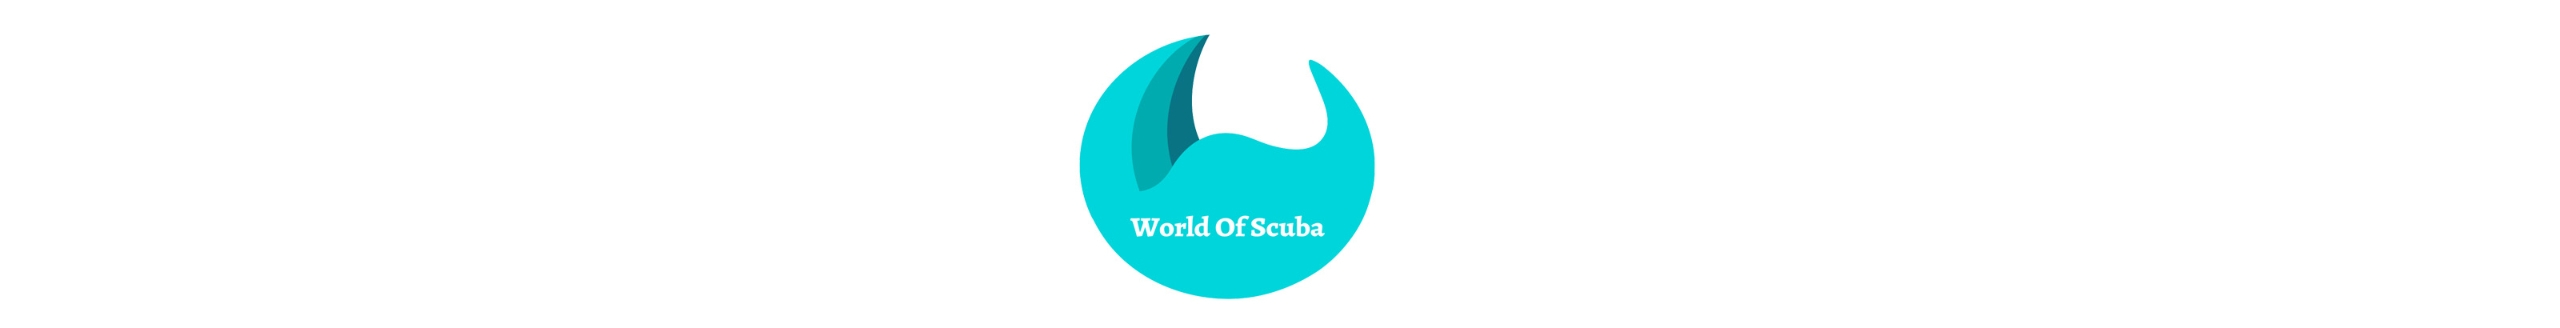 World Of Scuba (@worldofscuba) Cover Image